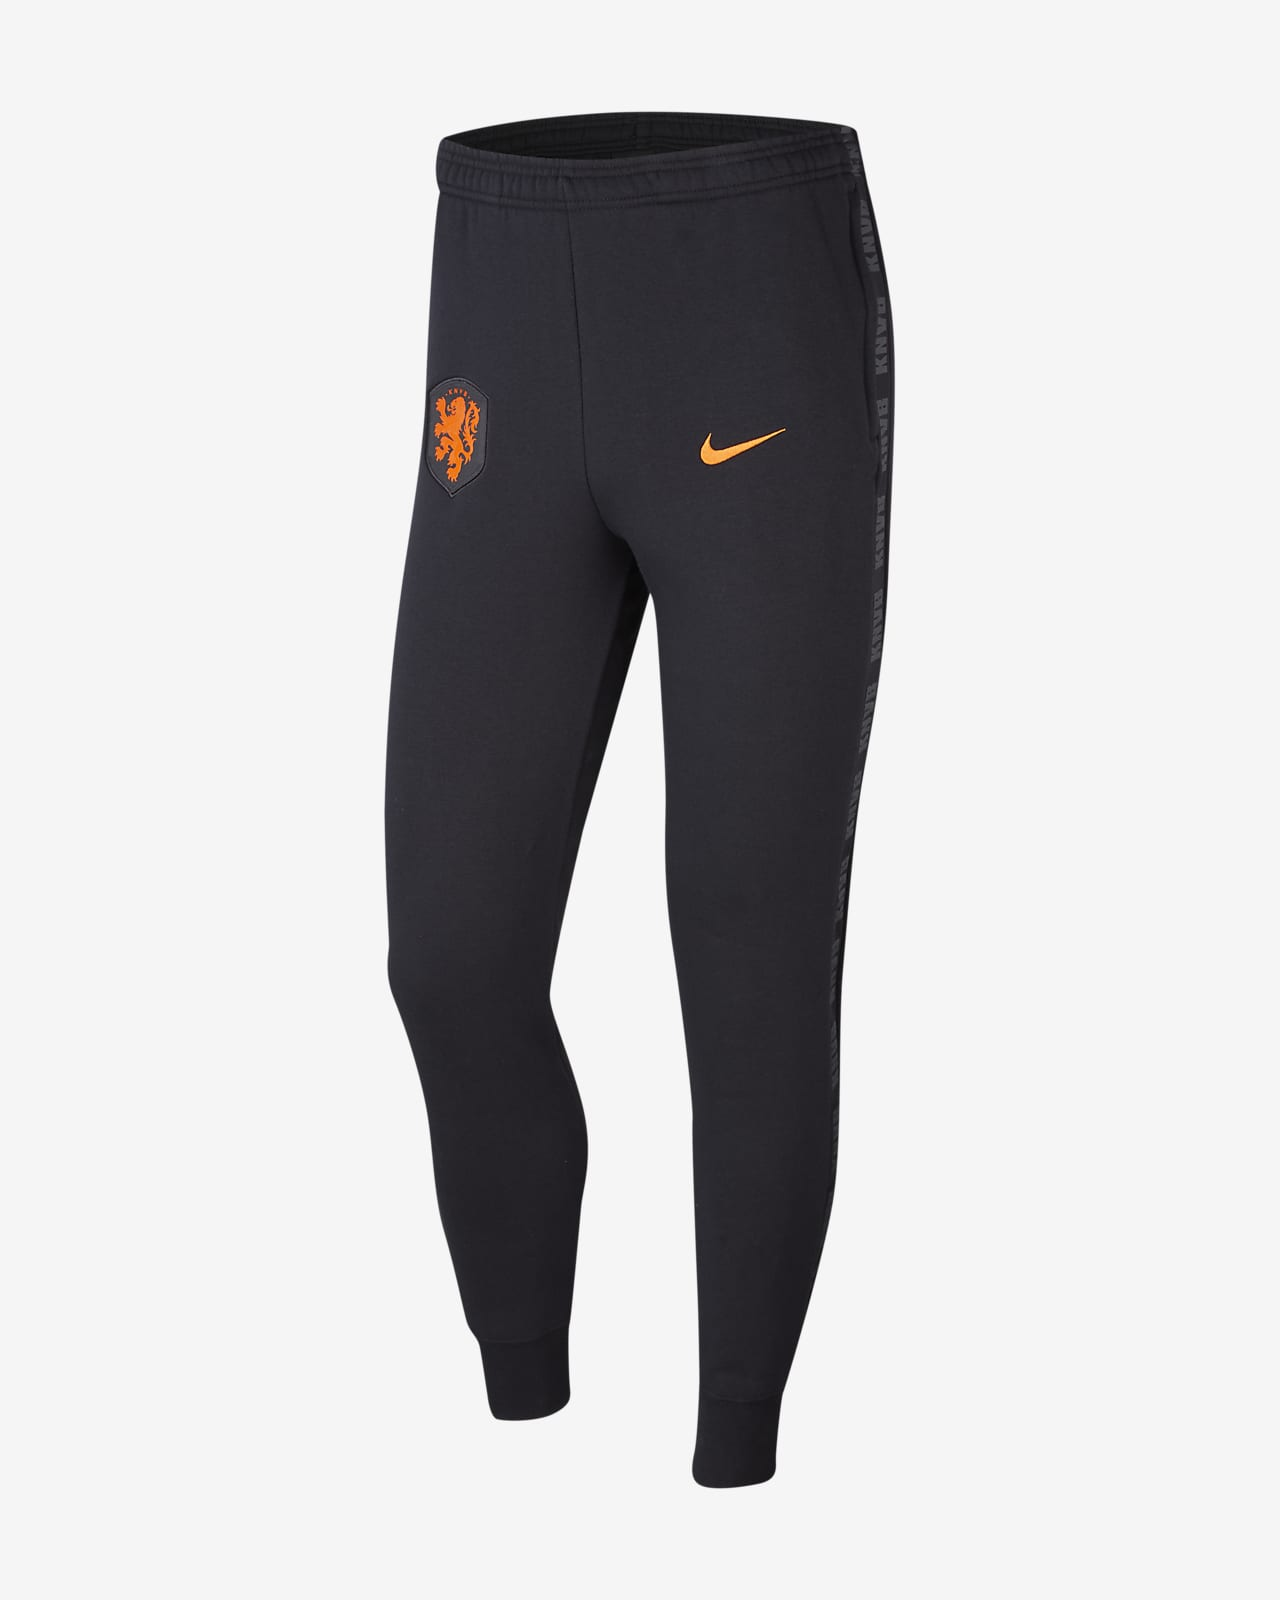 Netherlands Men's Fleece Football Pants